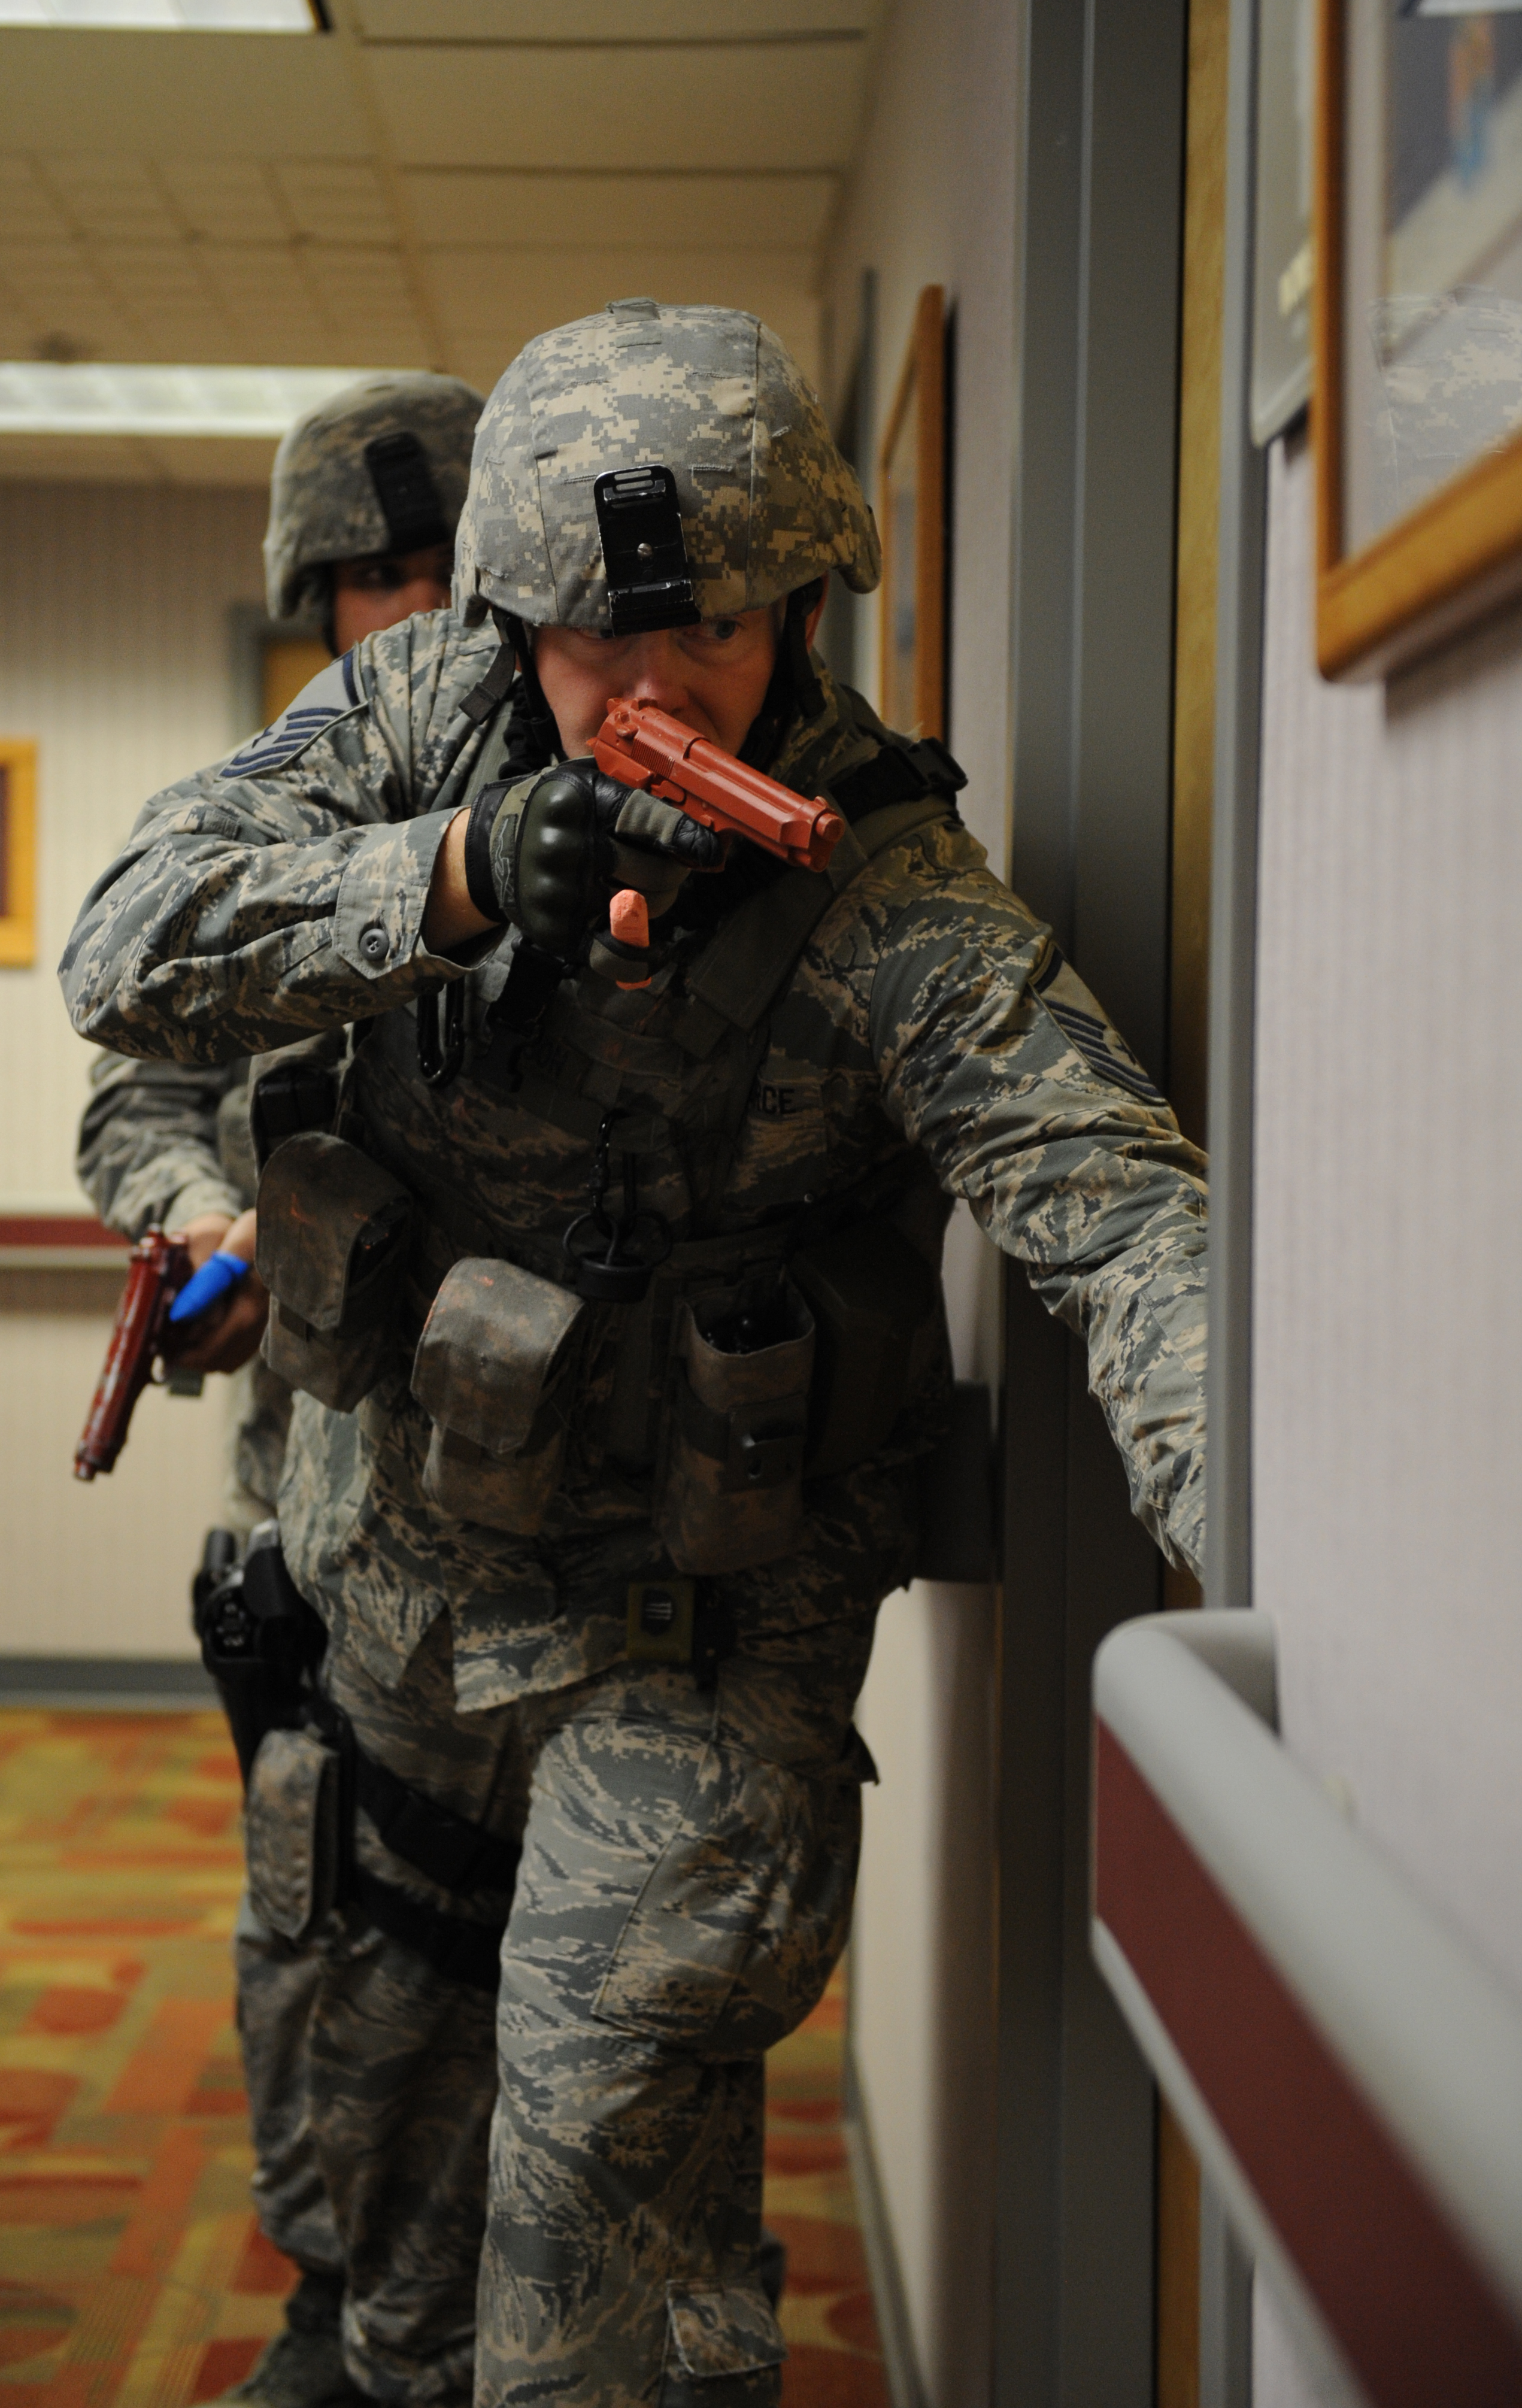 team whiteman participates in active shooter exercise > whiteman hi res photo details